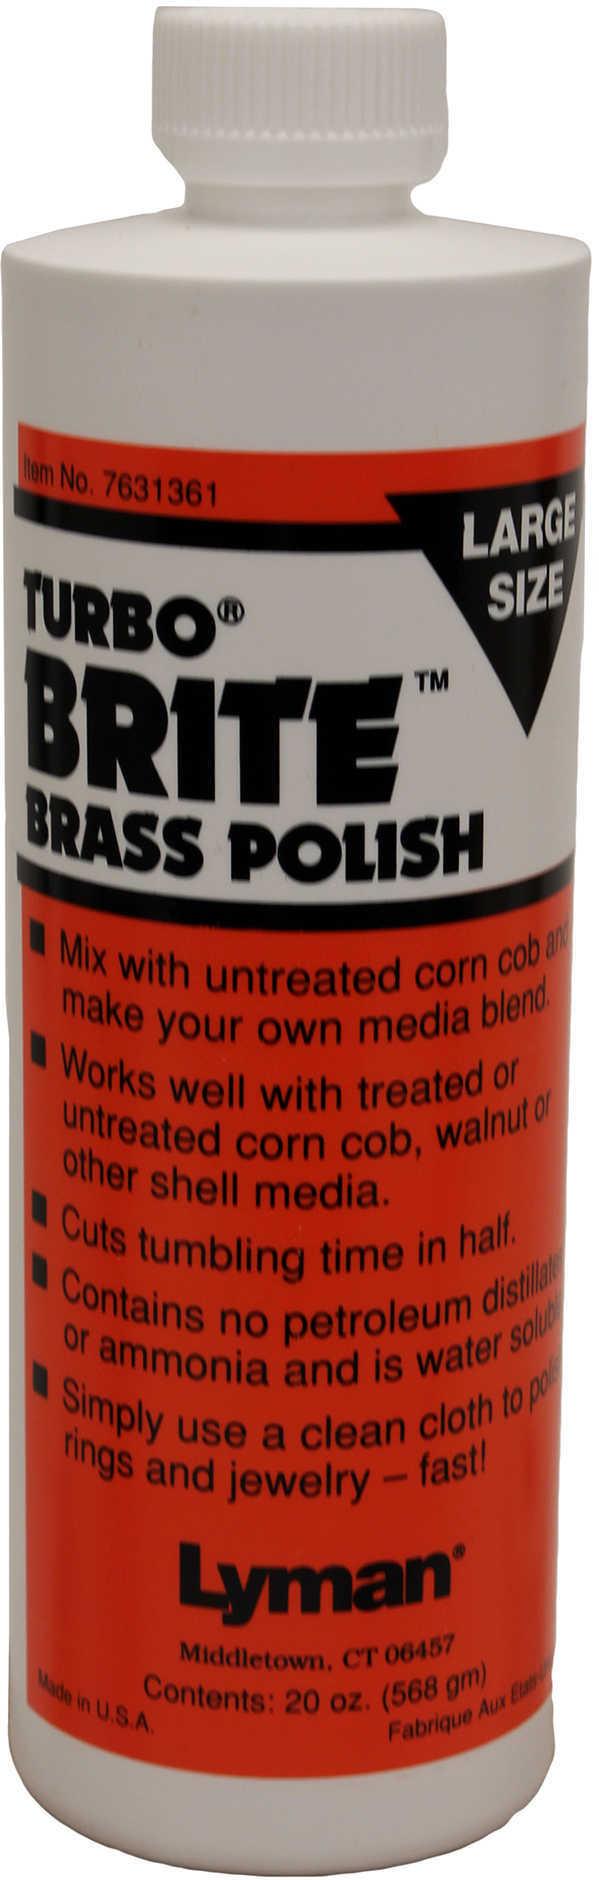 Lyman Turbo Brite Brass Polish 20Oz